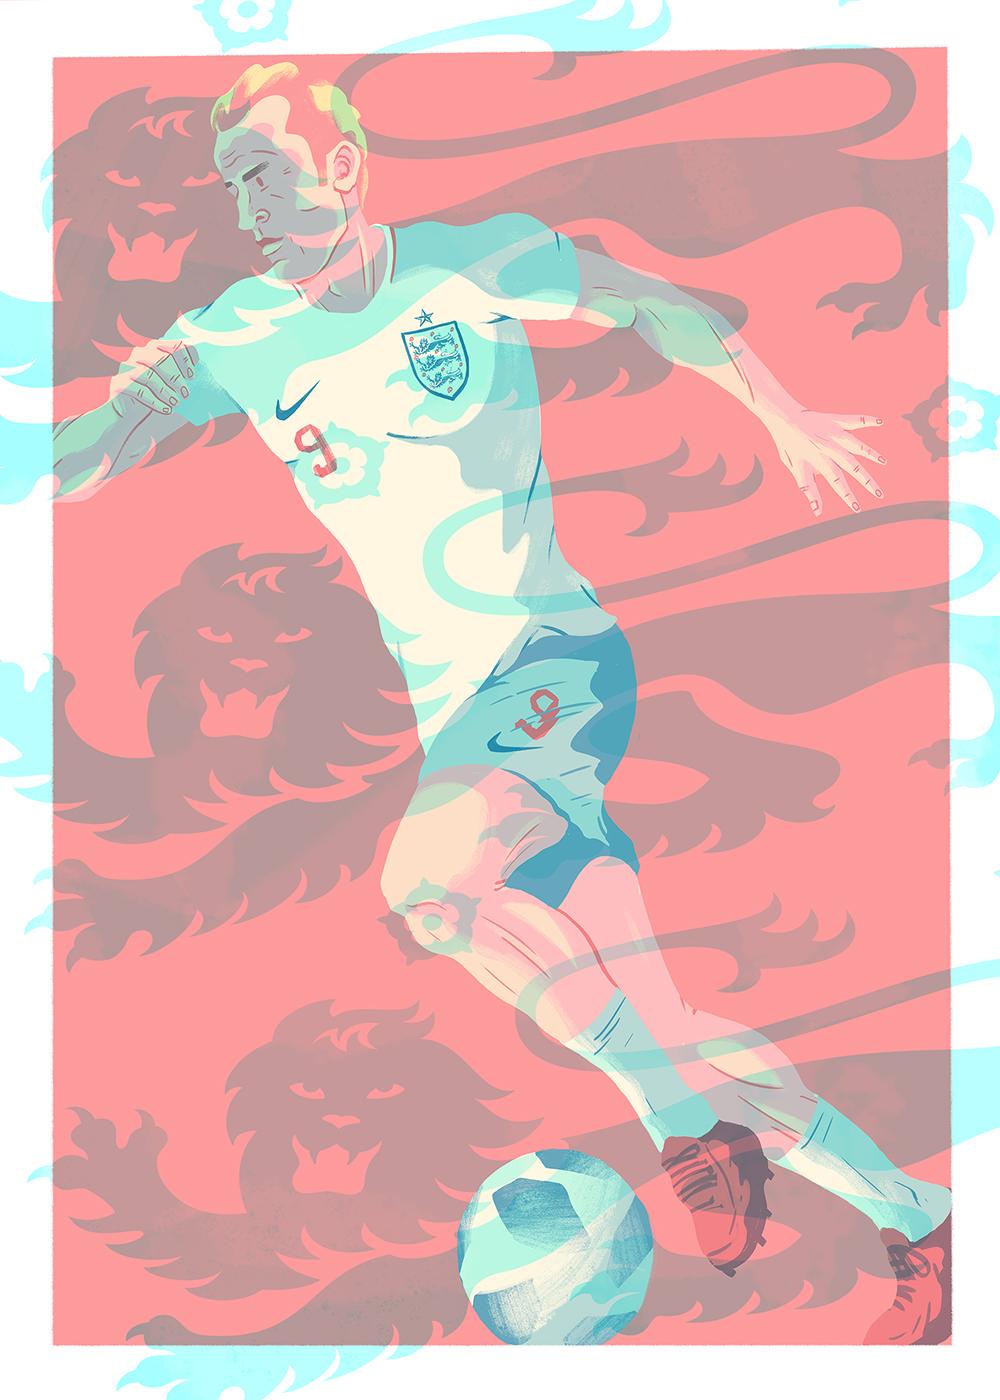 HarryKane-England-illustration.jpg